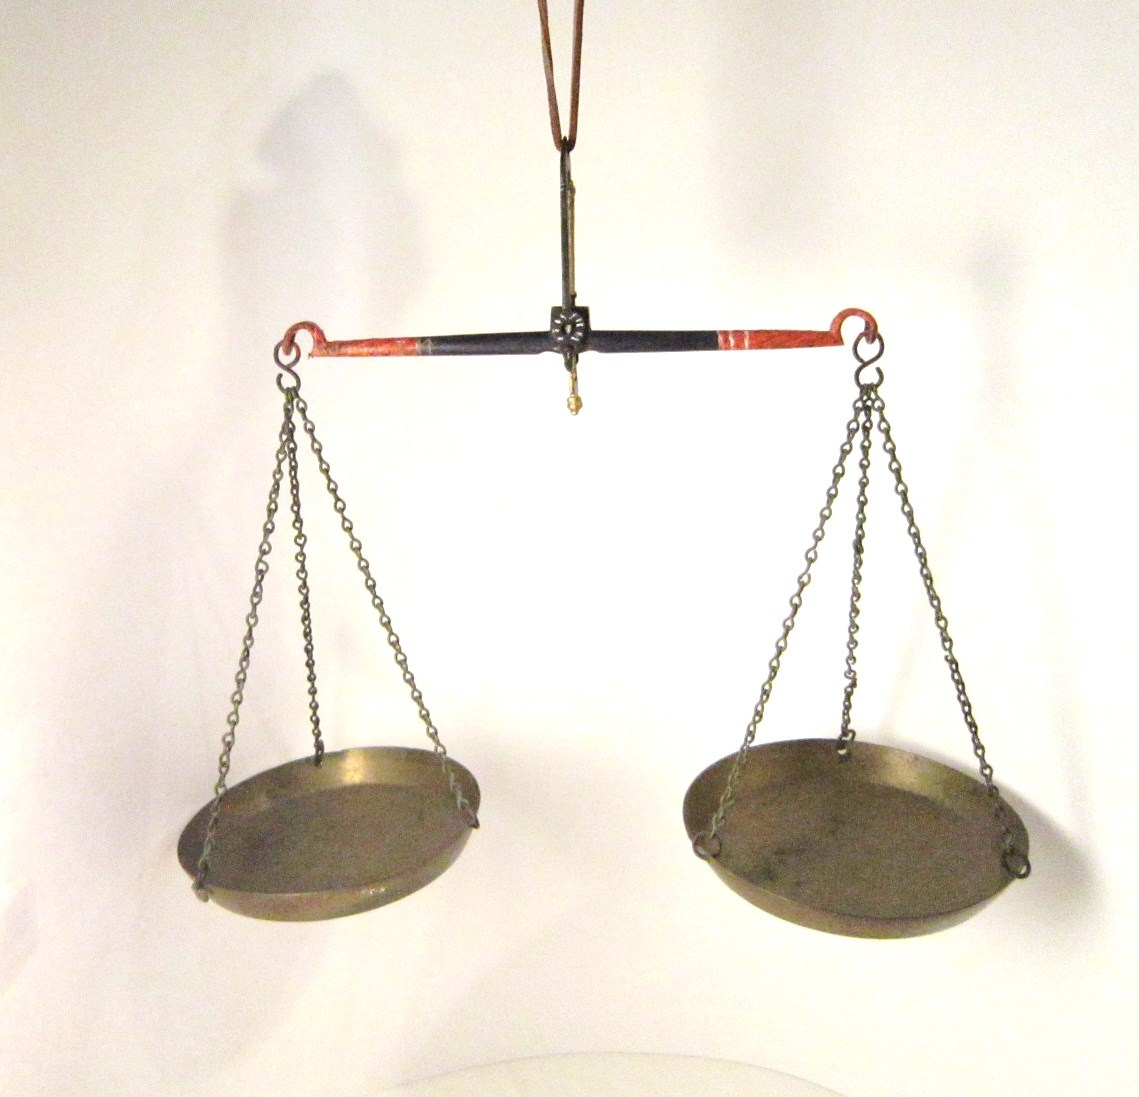 pan balance scale - photo #47